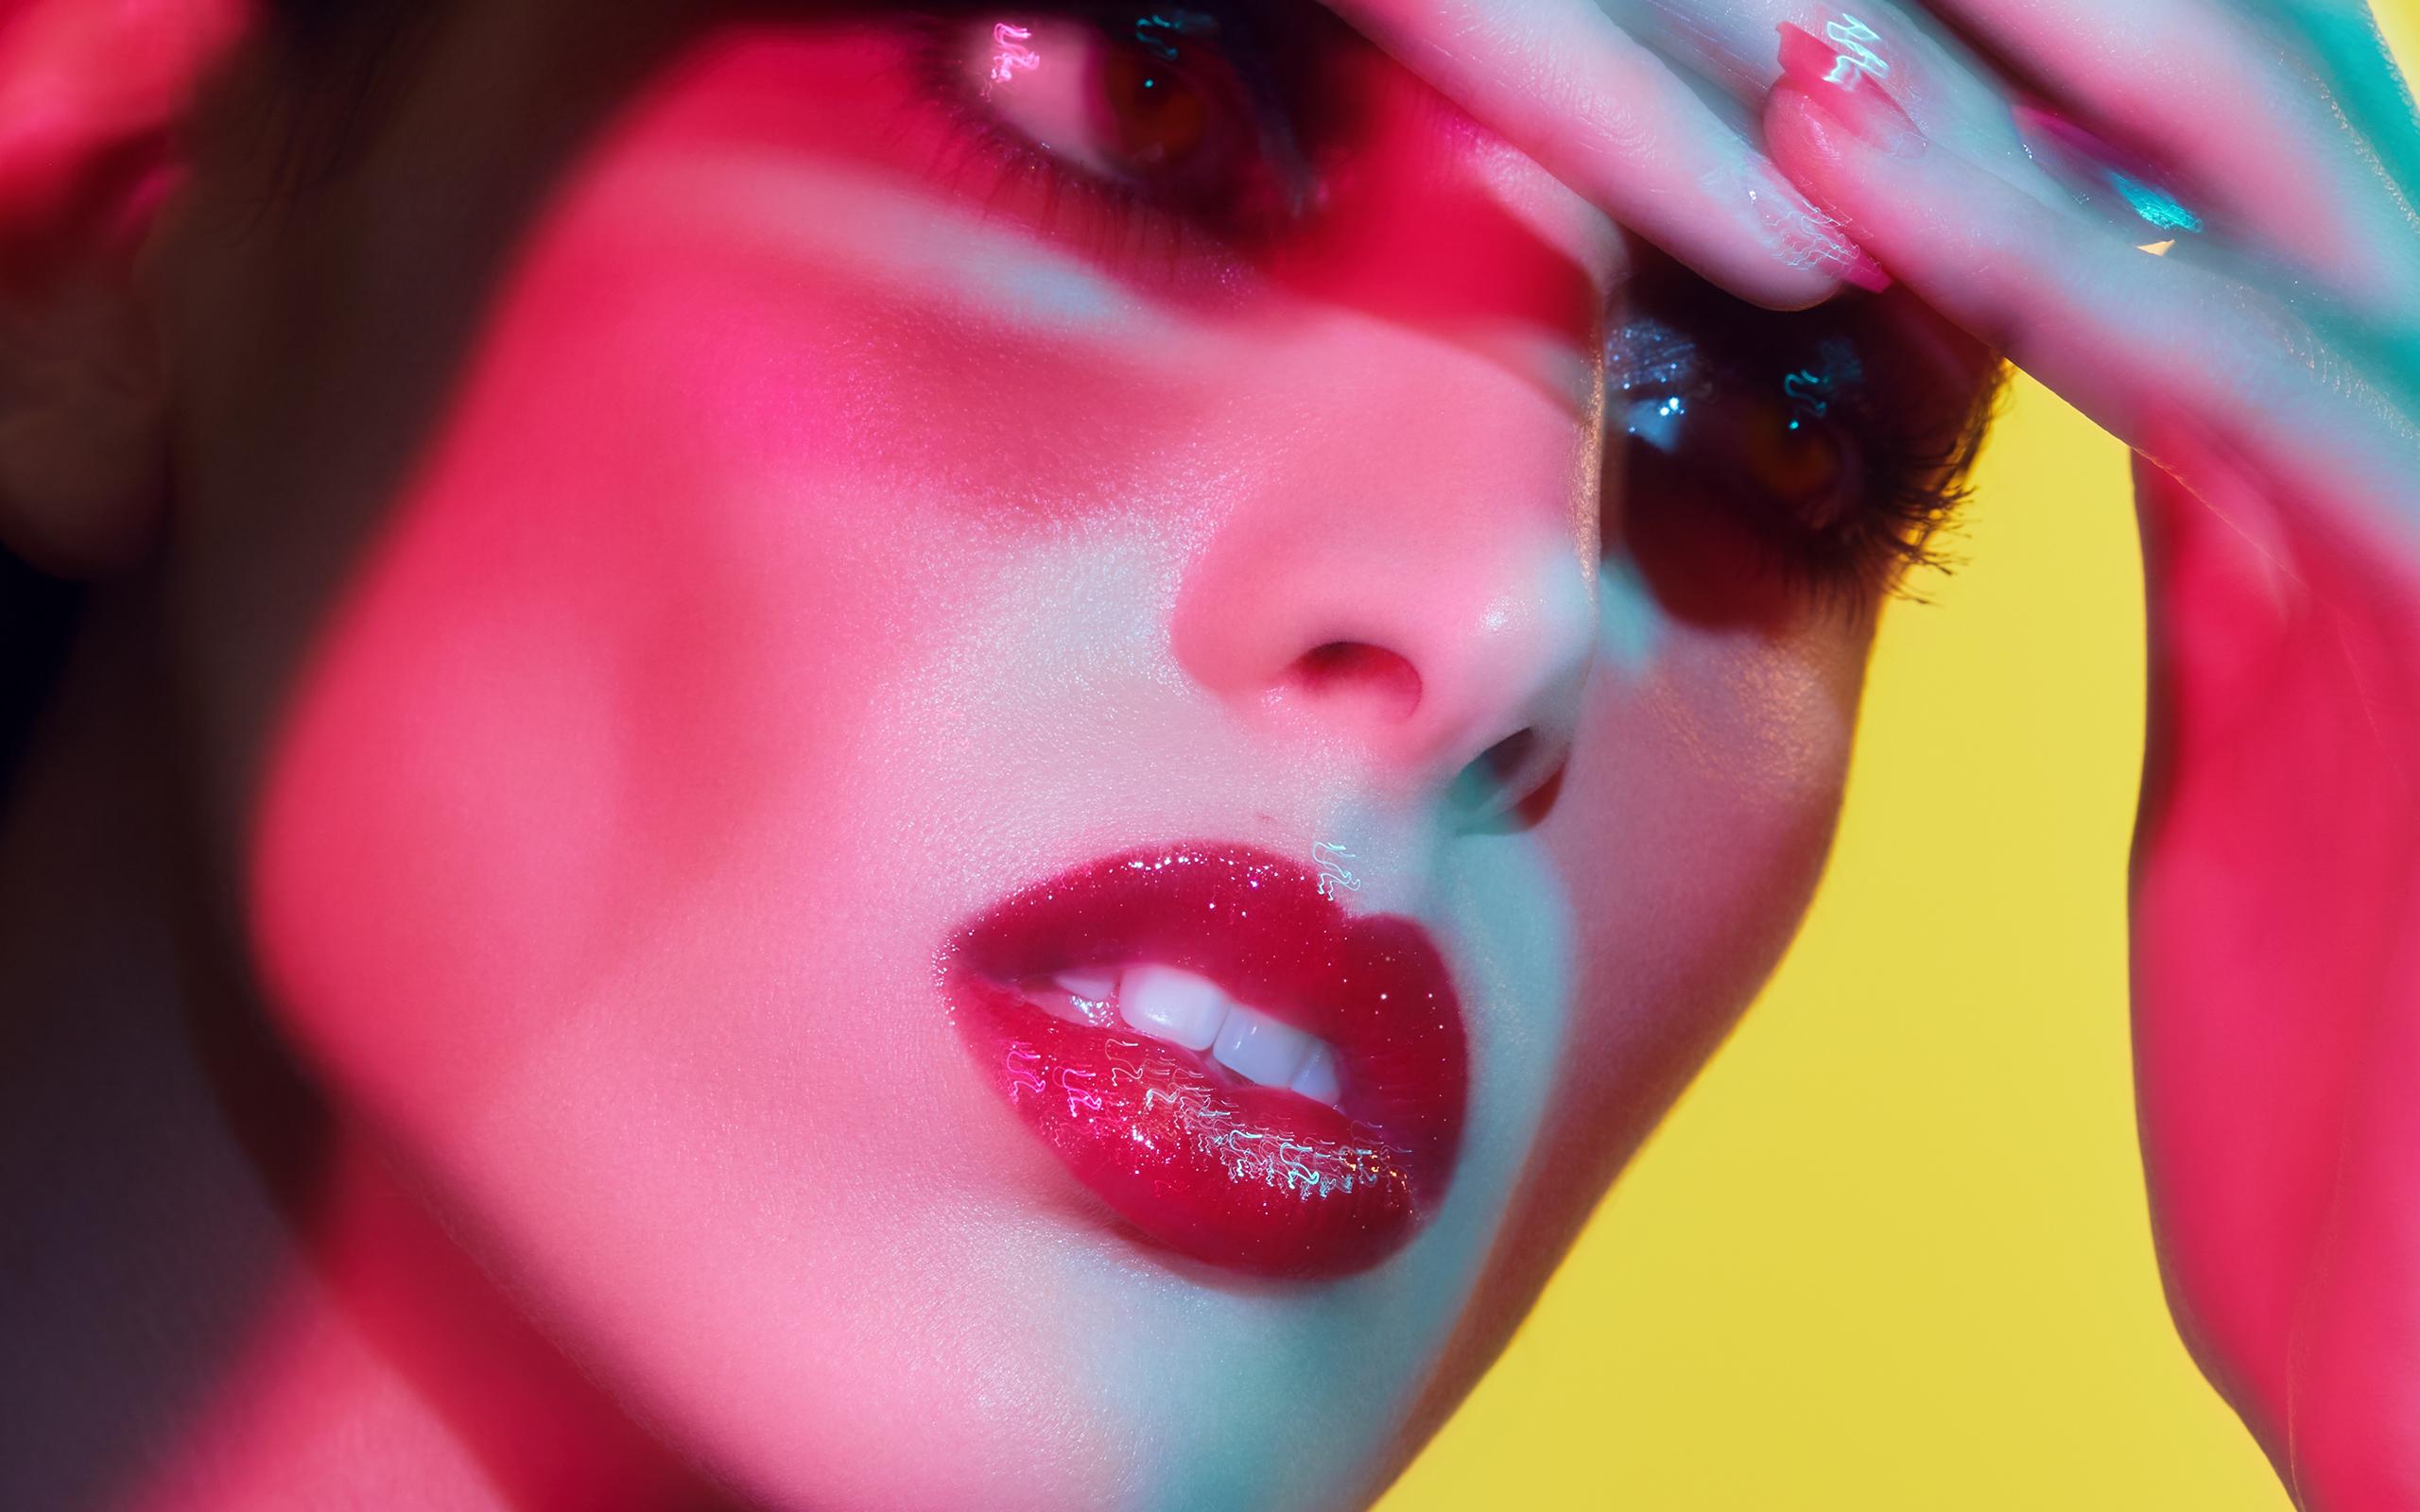 @Christian Louboutin Beauty